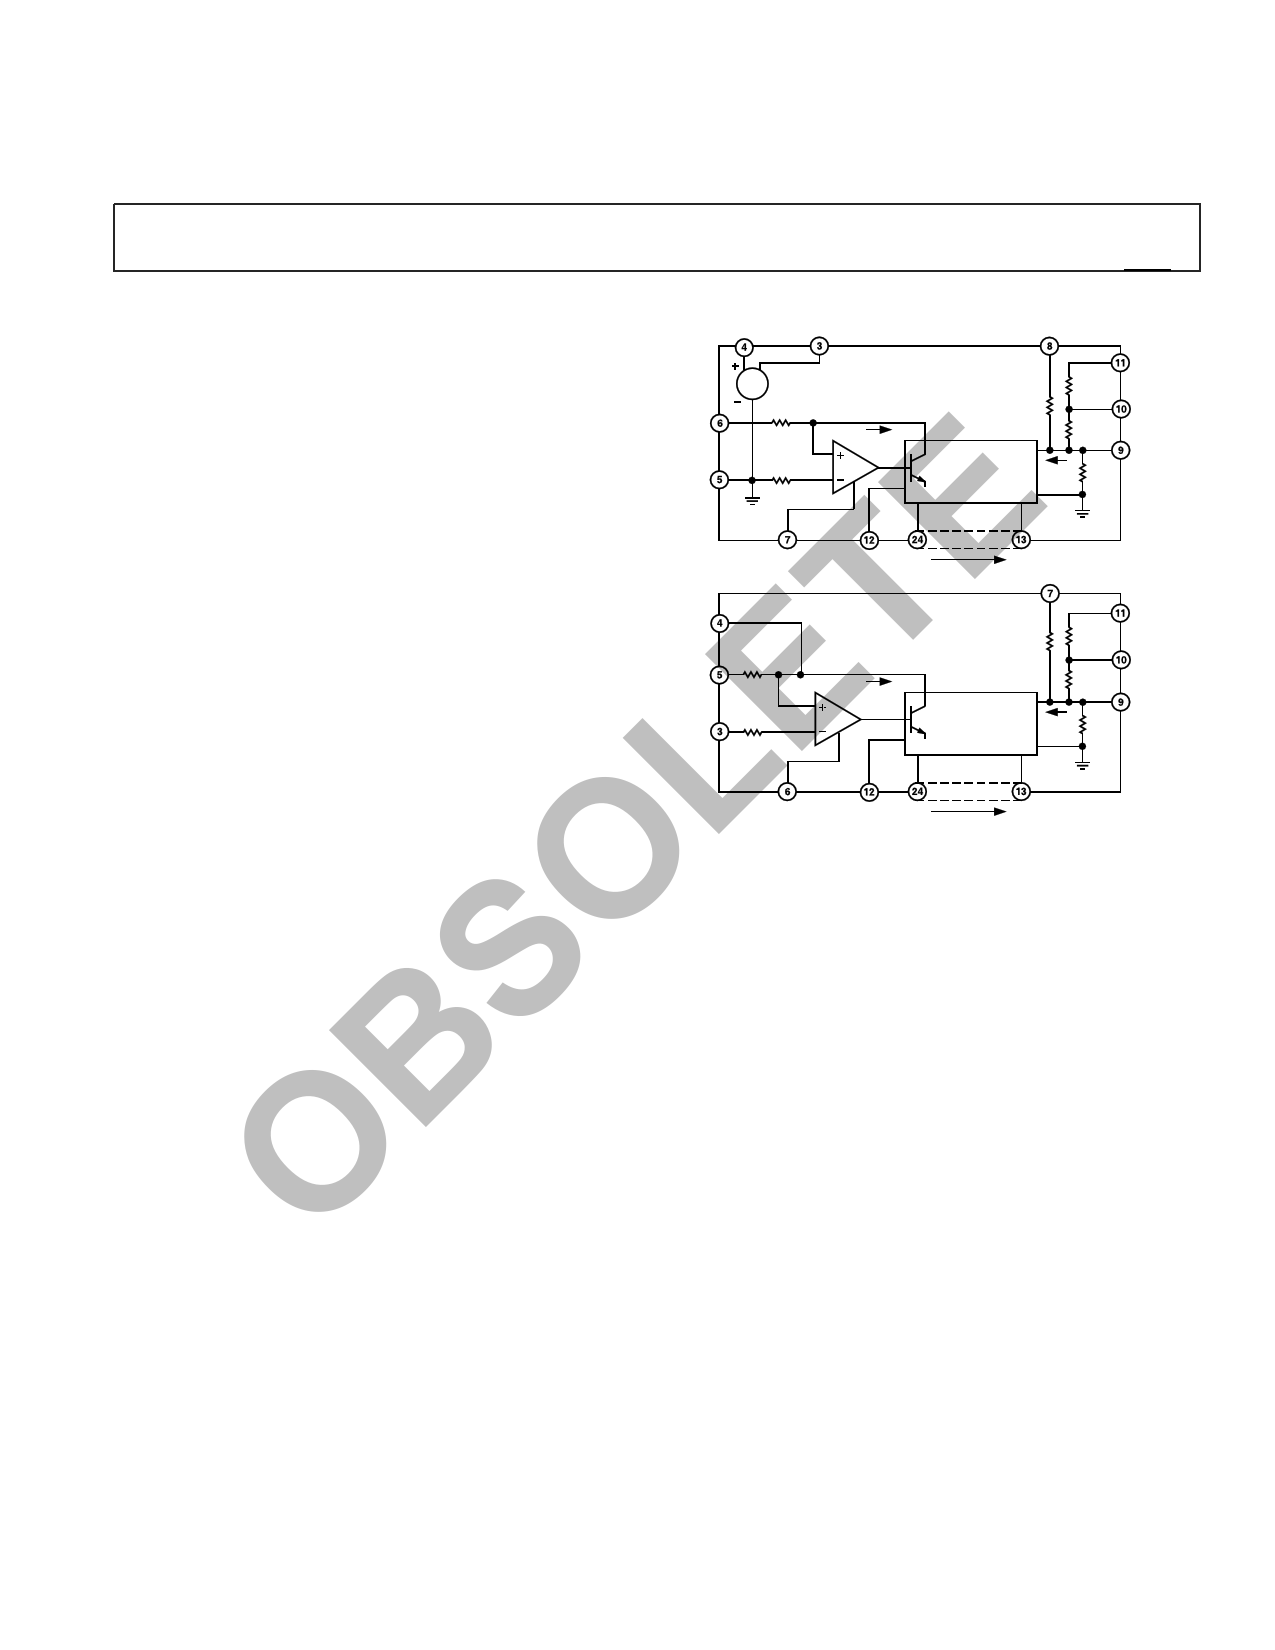 AD566A datasheet